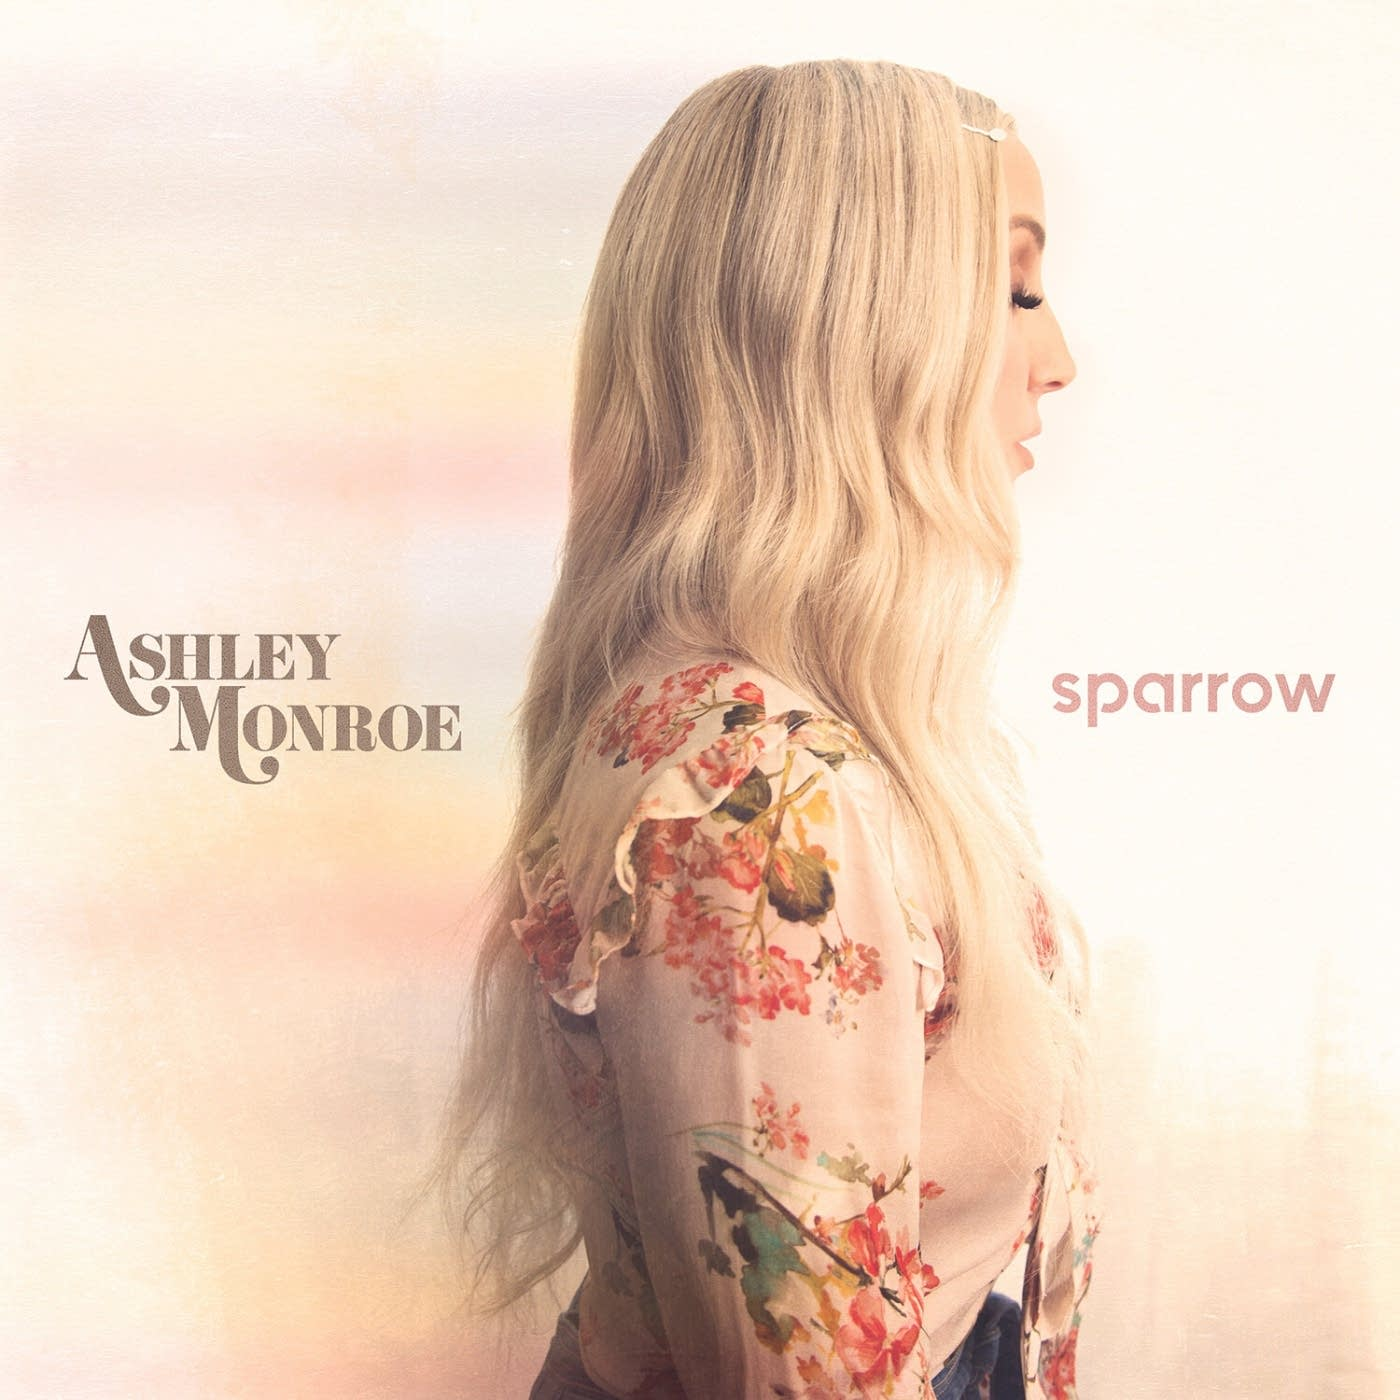 Ashley Monroe, 'Sparrow'